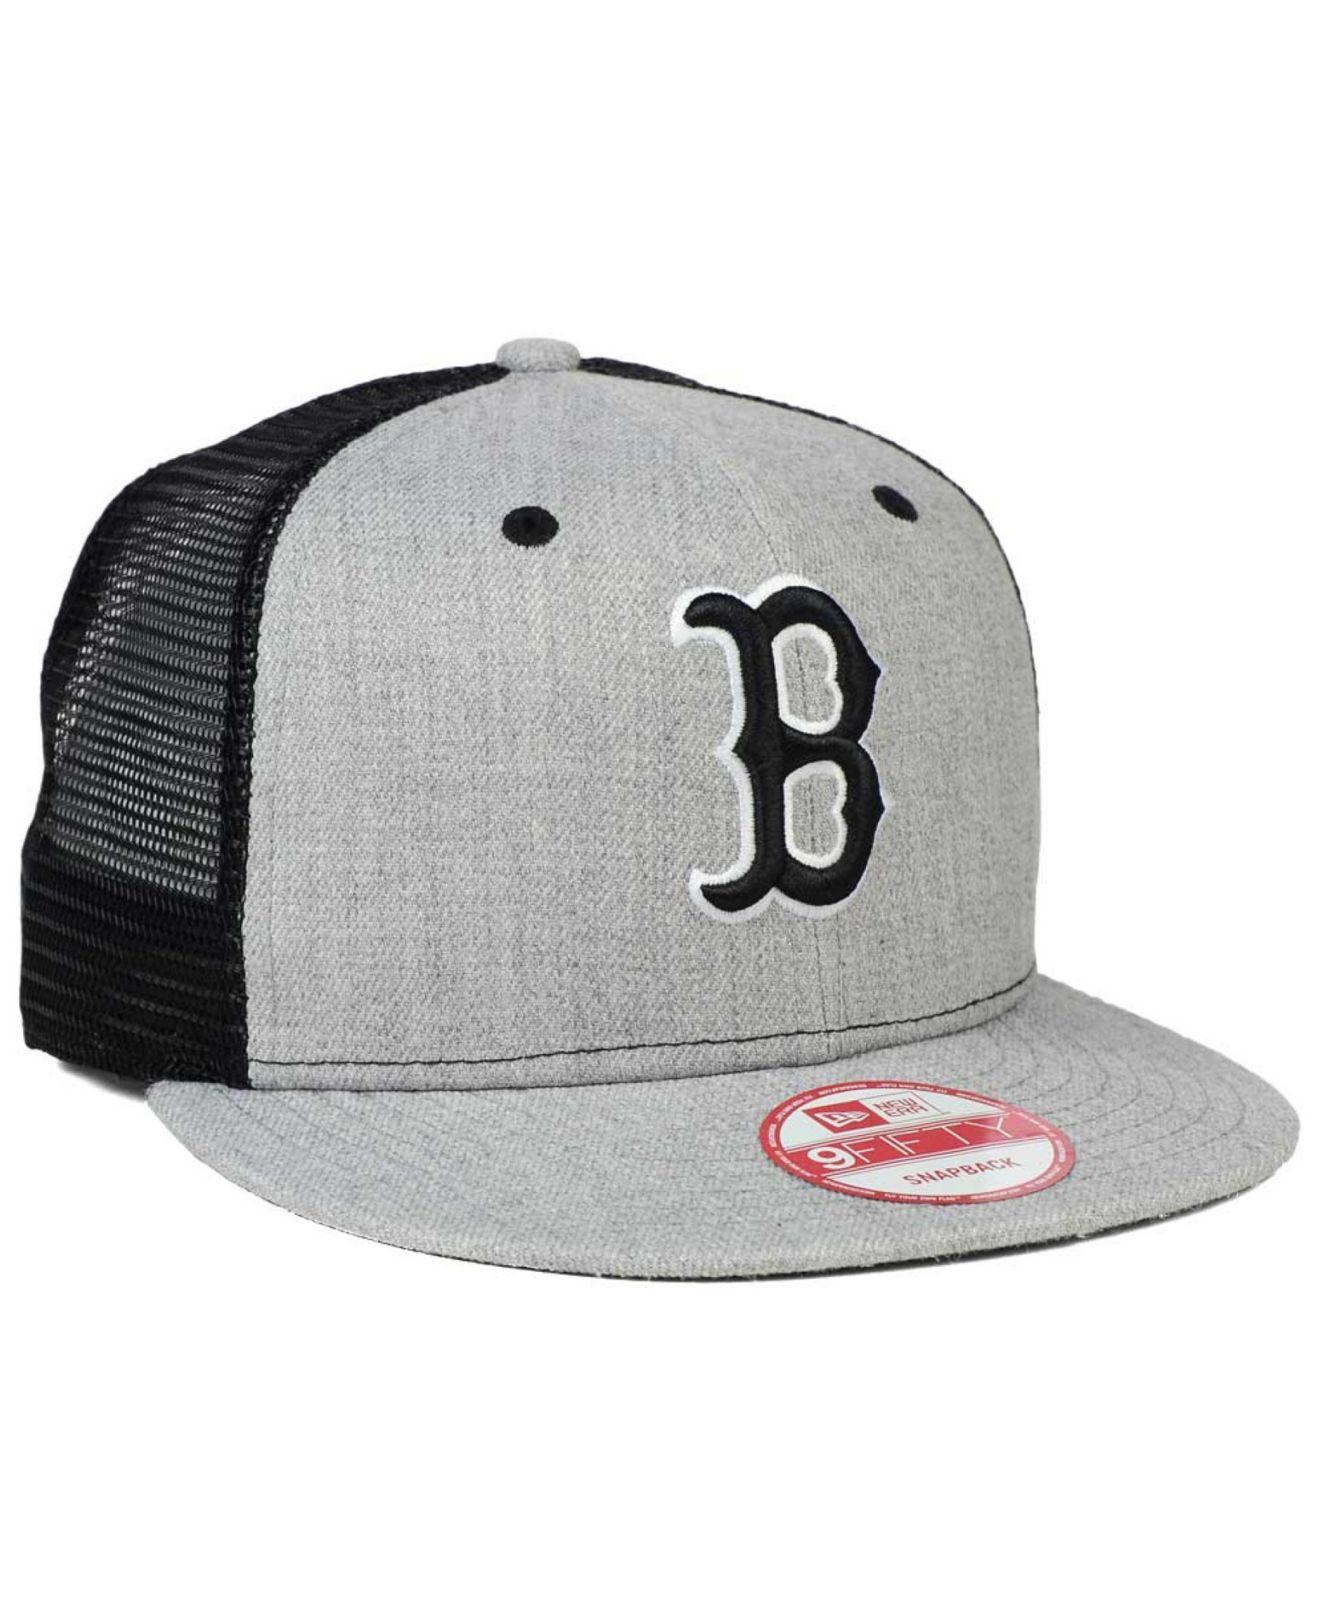 Lyst - KTZ Boston Red Sox Heather Trucker 9fifty Snapback Cap in ... acb80097322c